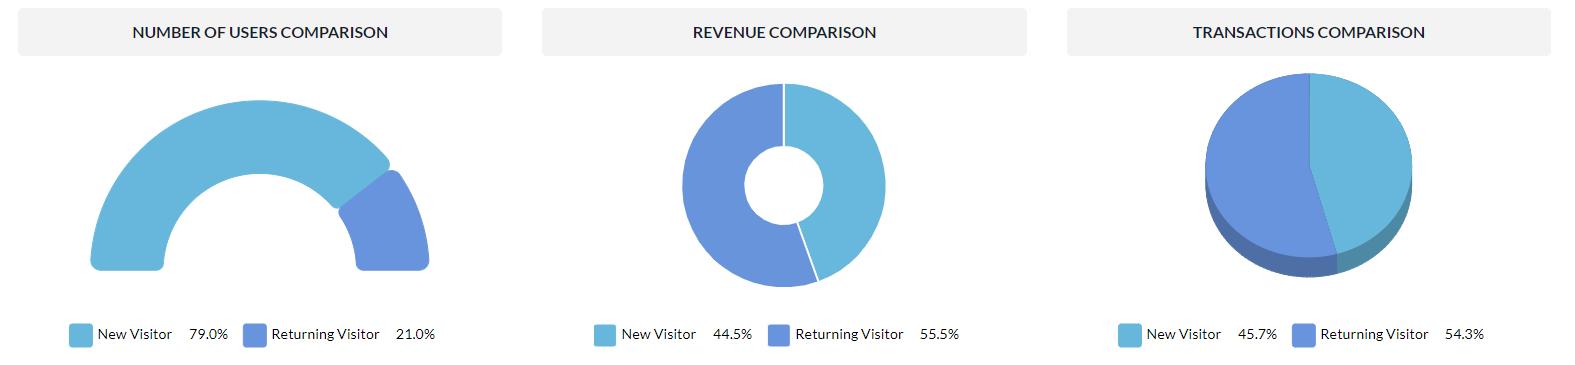 New-vs-Returning-Visitors-Ontrack-Analytics-Screenshot-Data-Visualization